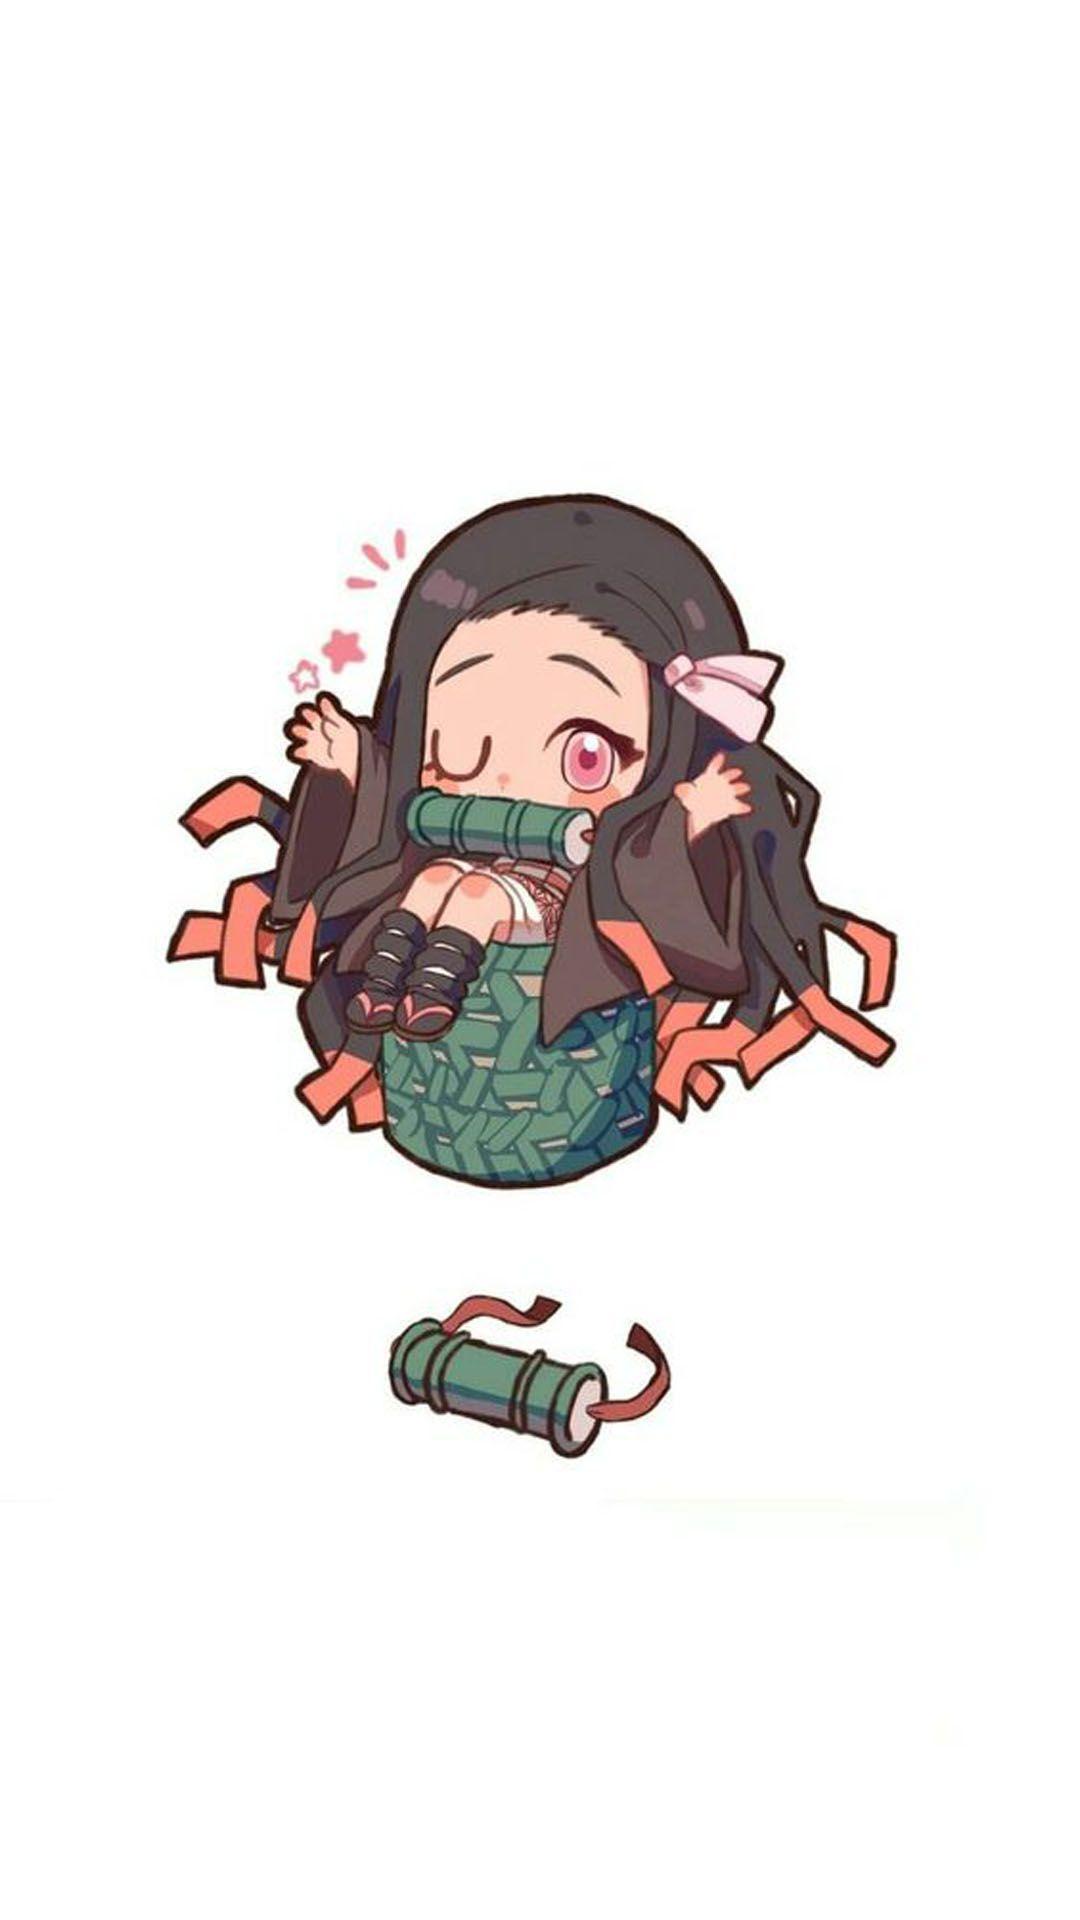 Nezuko Kamado Wallpaper In 2020 Anime Chibi Anime Demon Chibi